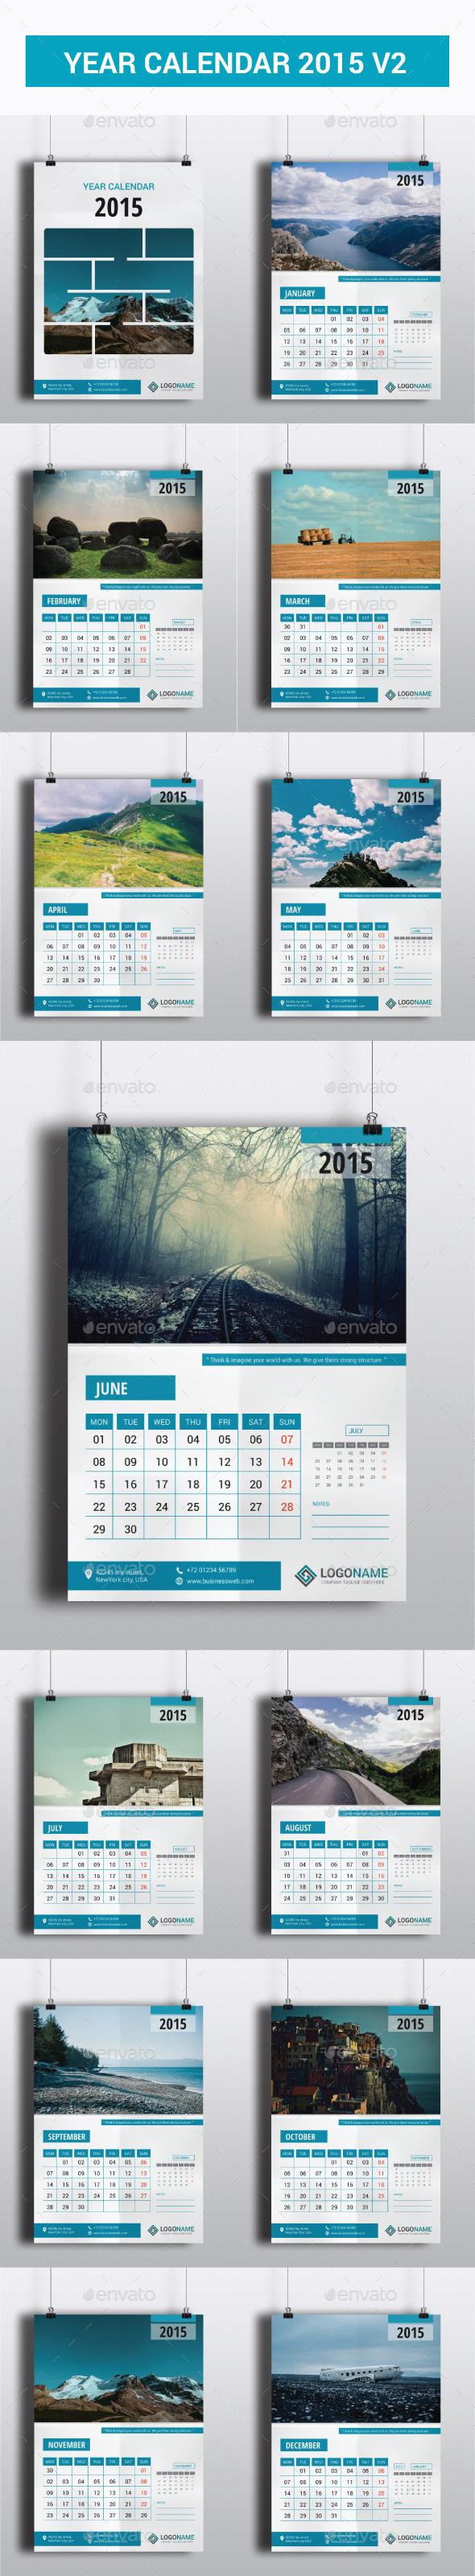 Year Calendar 2015 V2 - Calendars Stationery